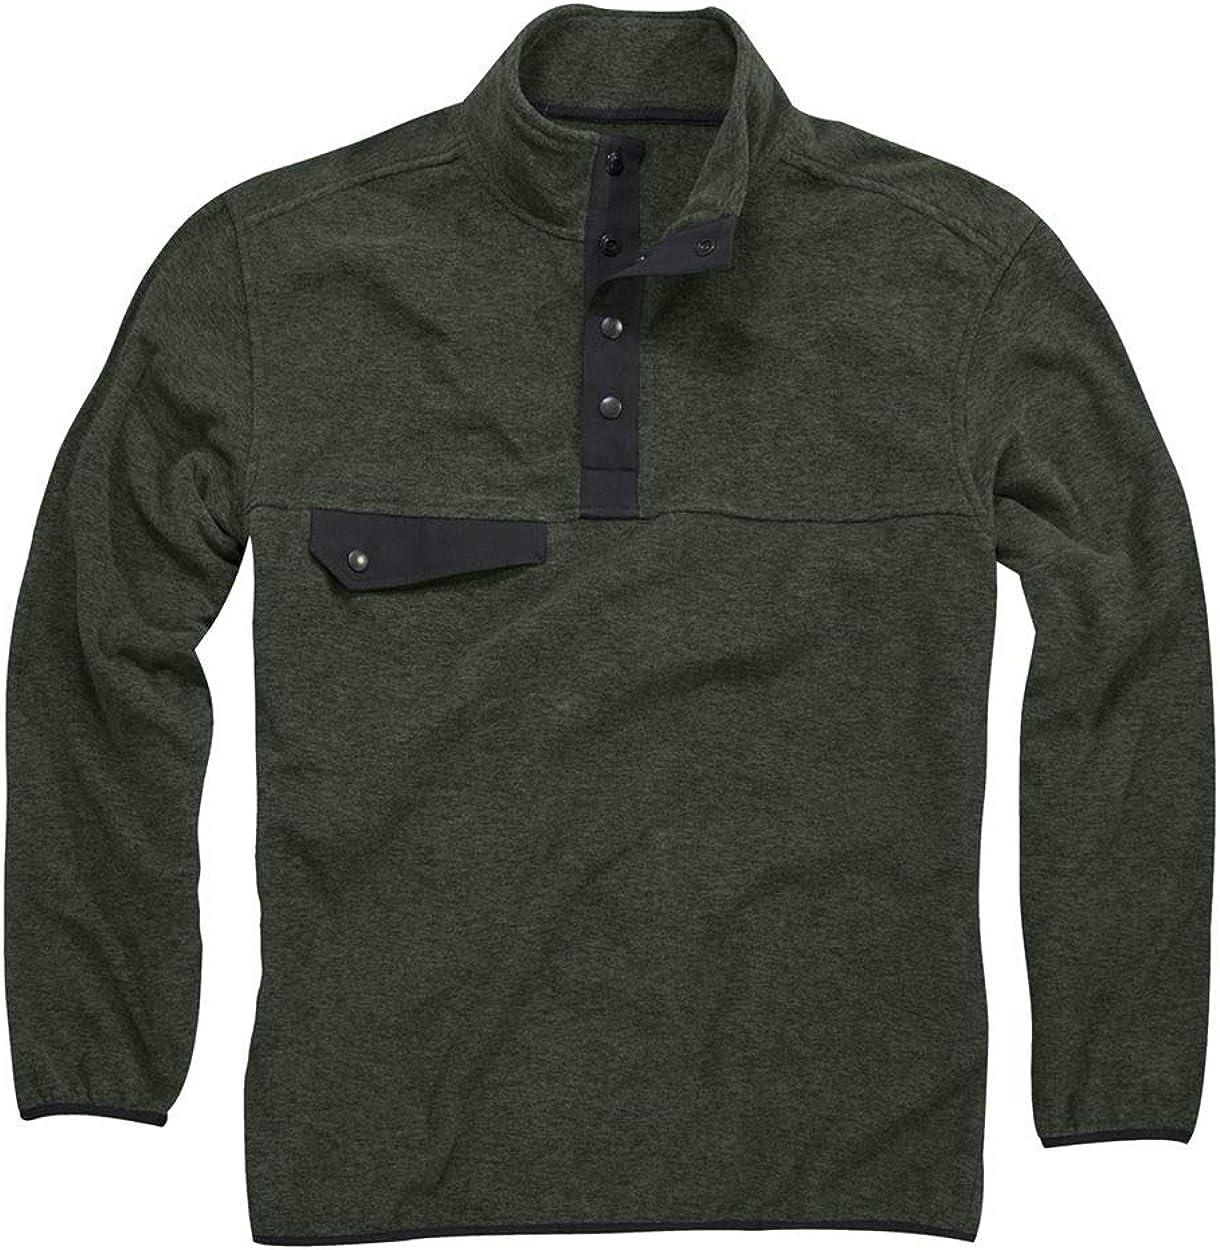 Free shipping anywhere in the nation DRI Duck Men's 7352 Denali Fleece Sleeve Philadelphia Mall Long Pullover